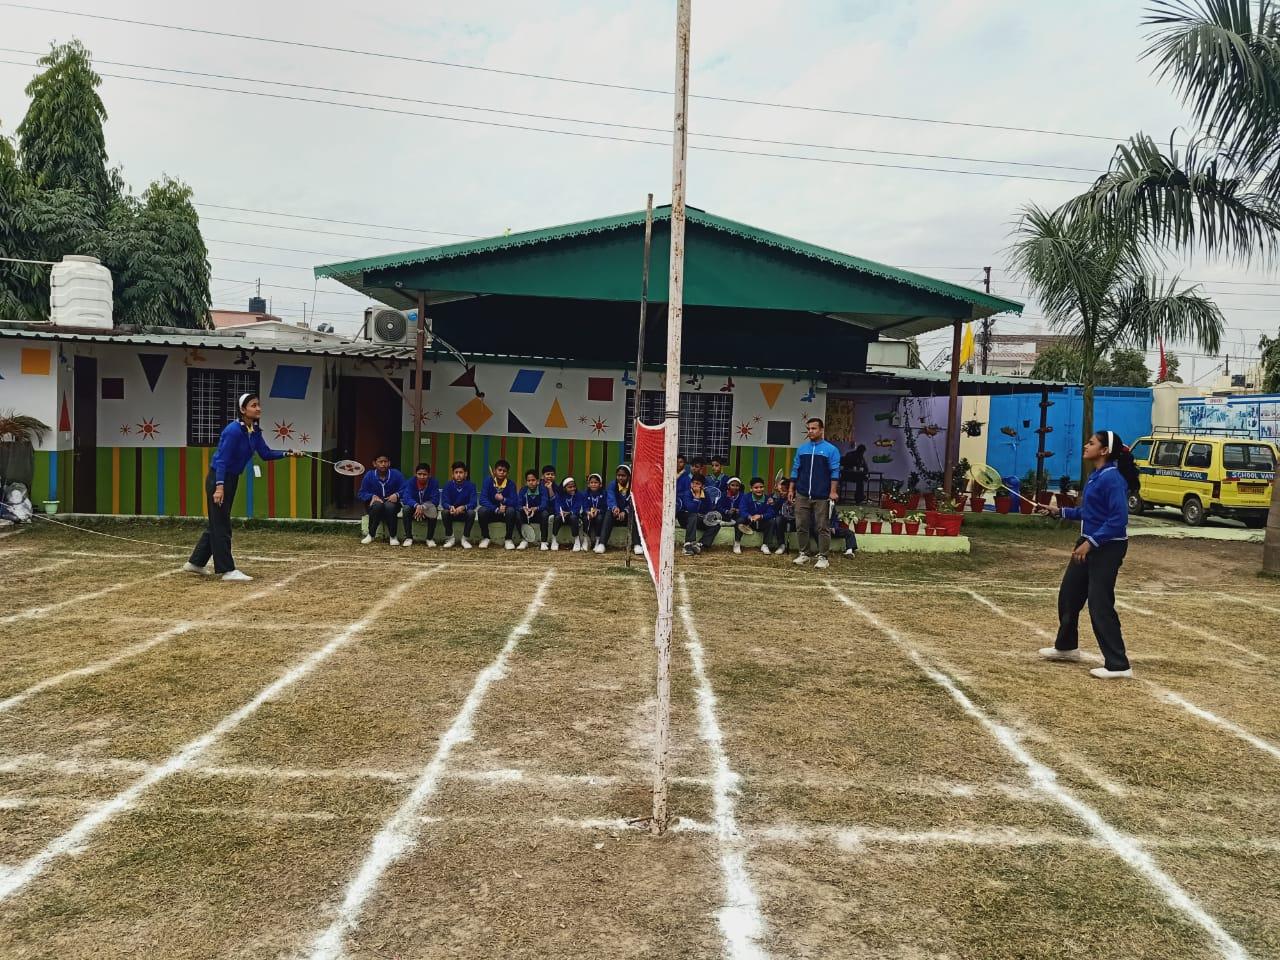 The Bhagirathi International School